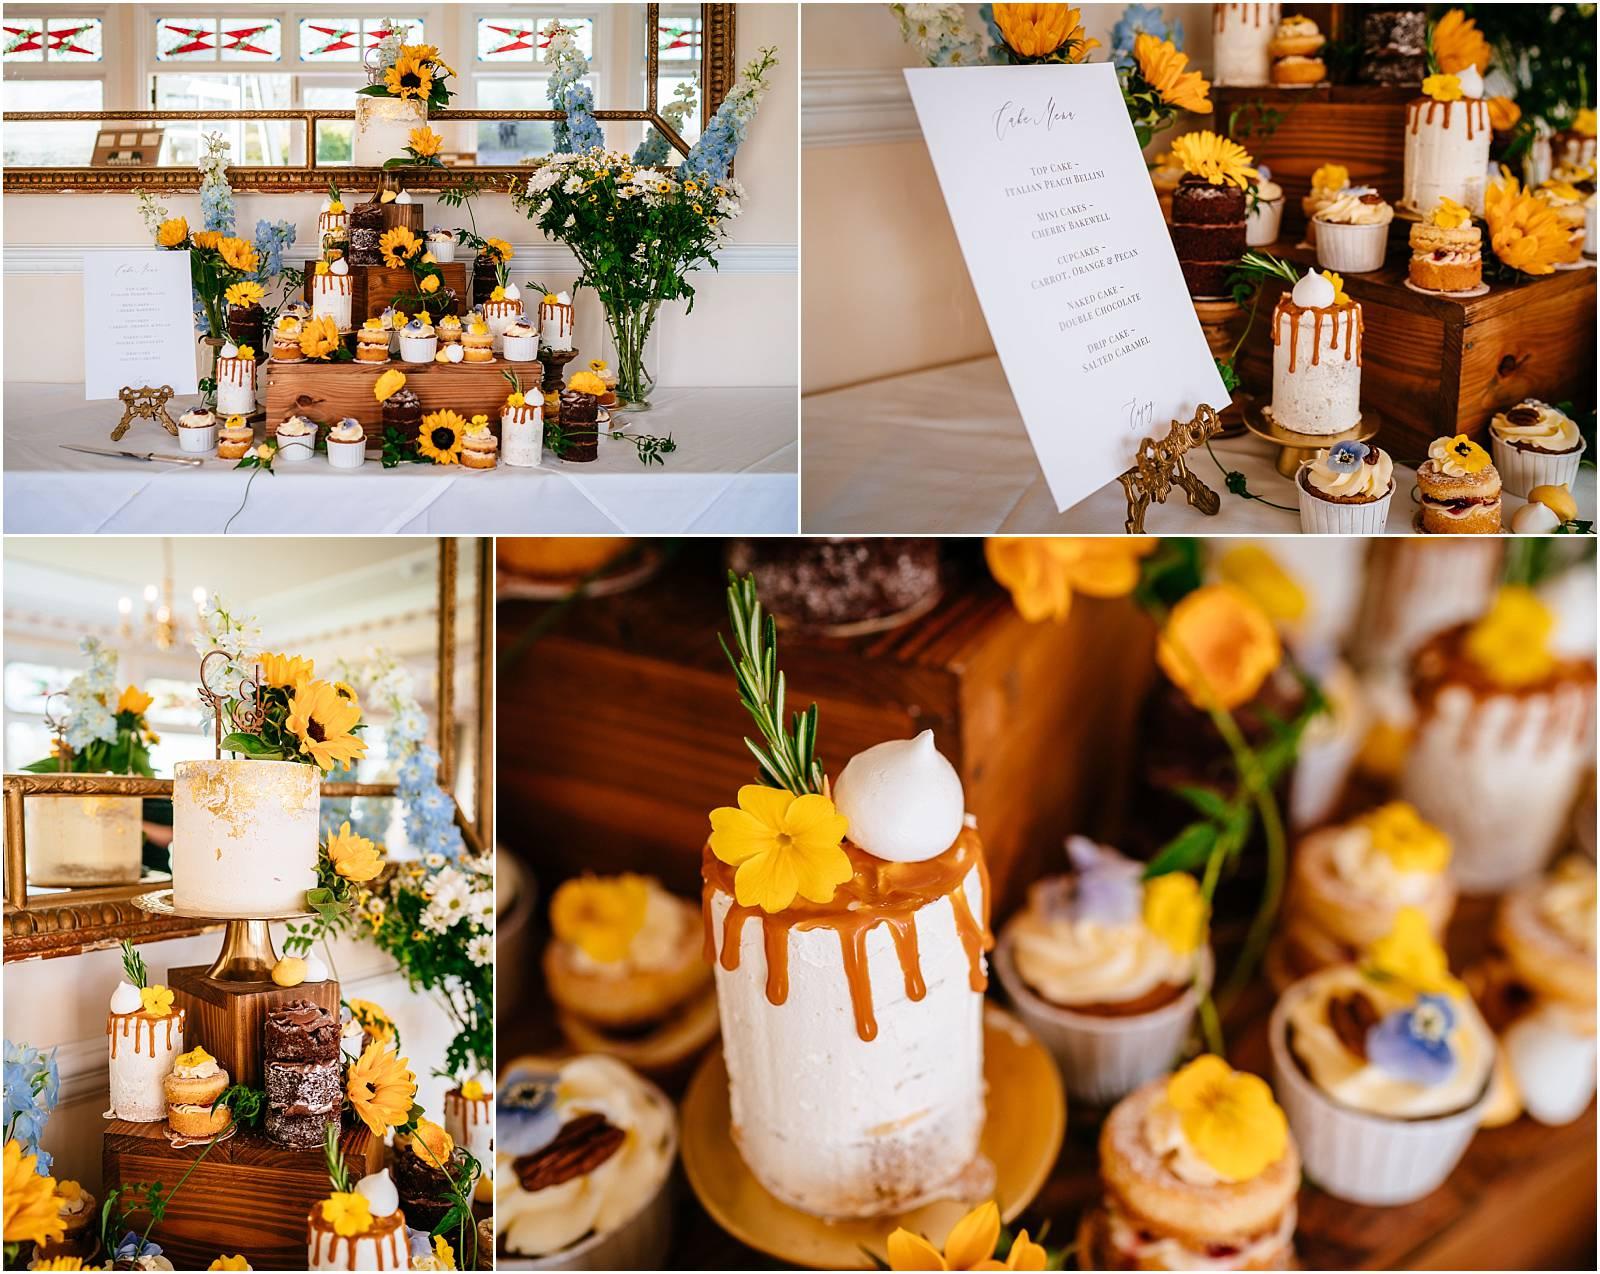 stunning mini cake spread at wedding